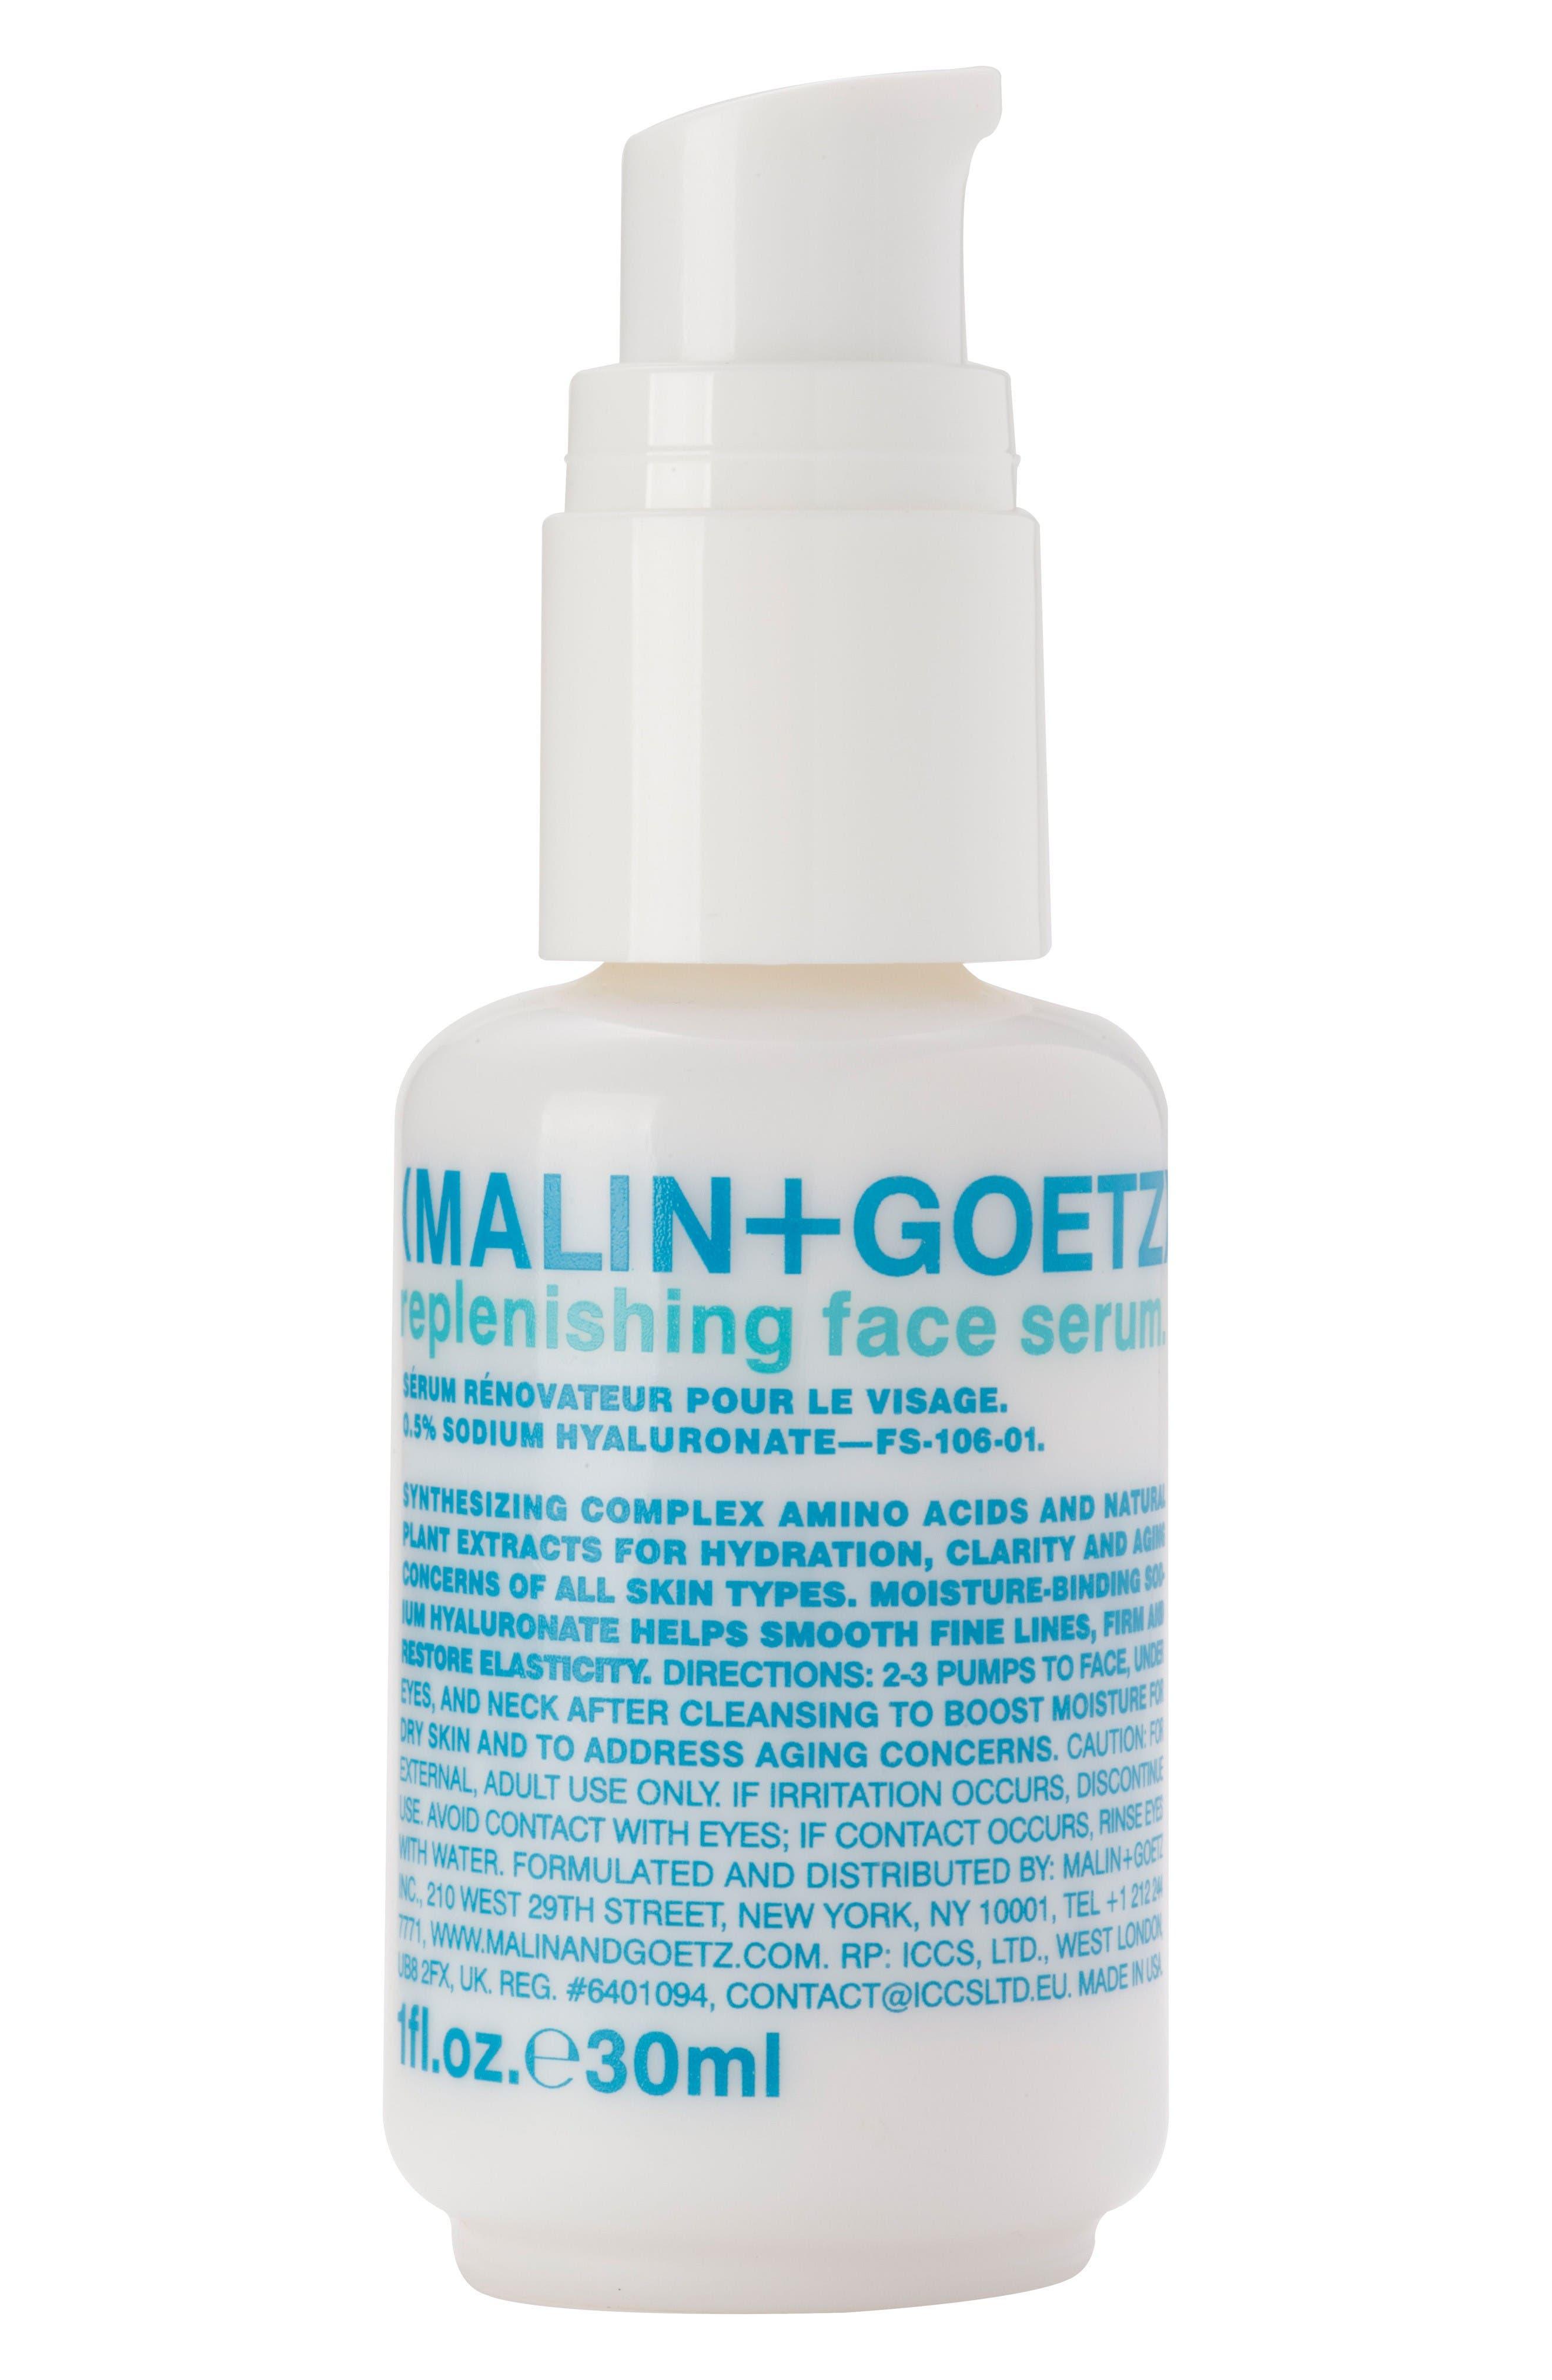 SPACE.NK.apothecary Malin + Goetz Replenishing Face Serum